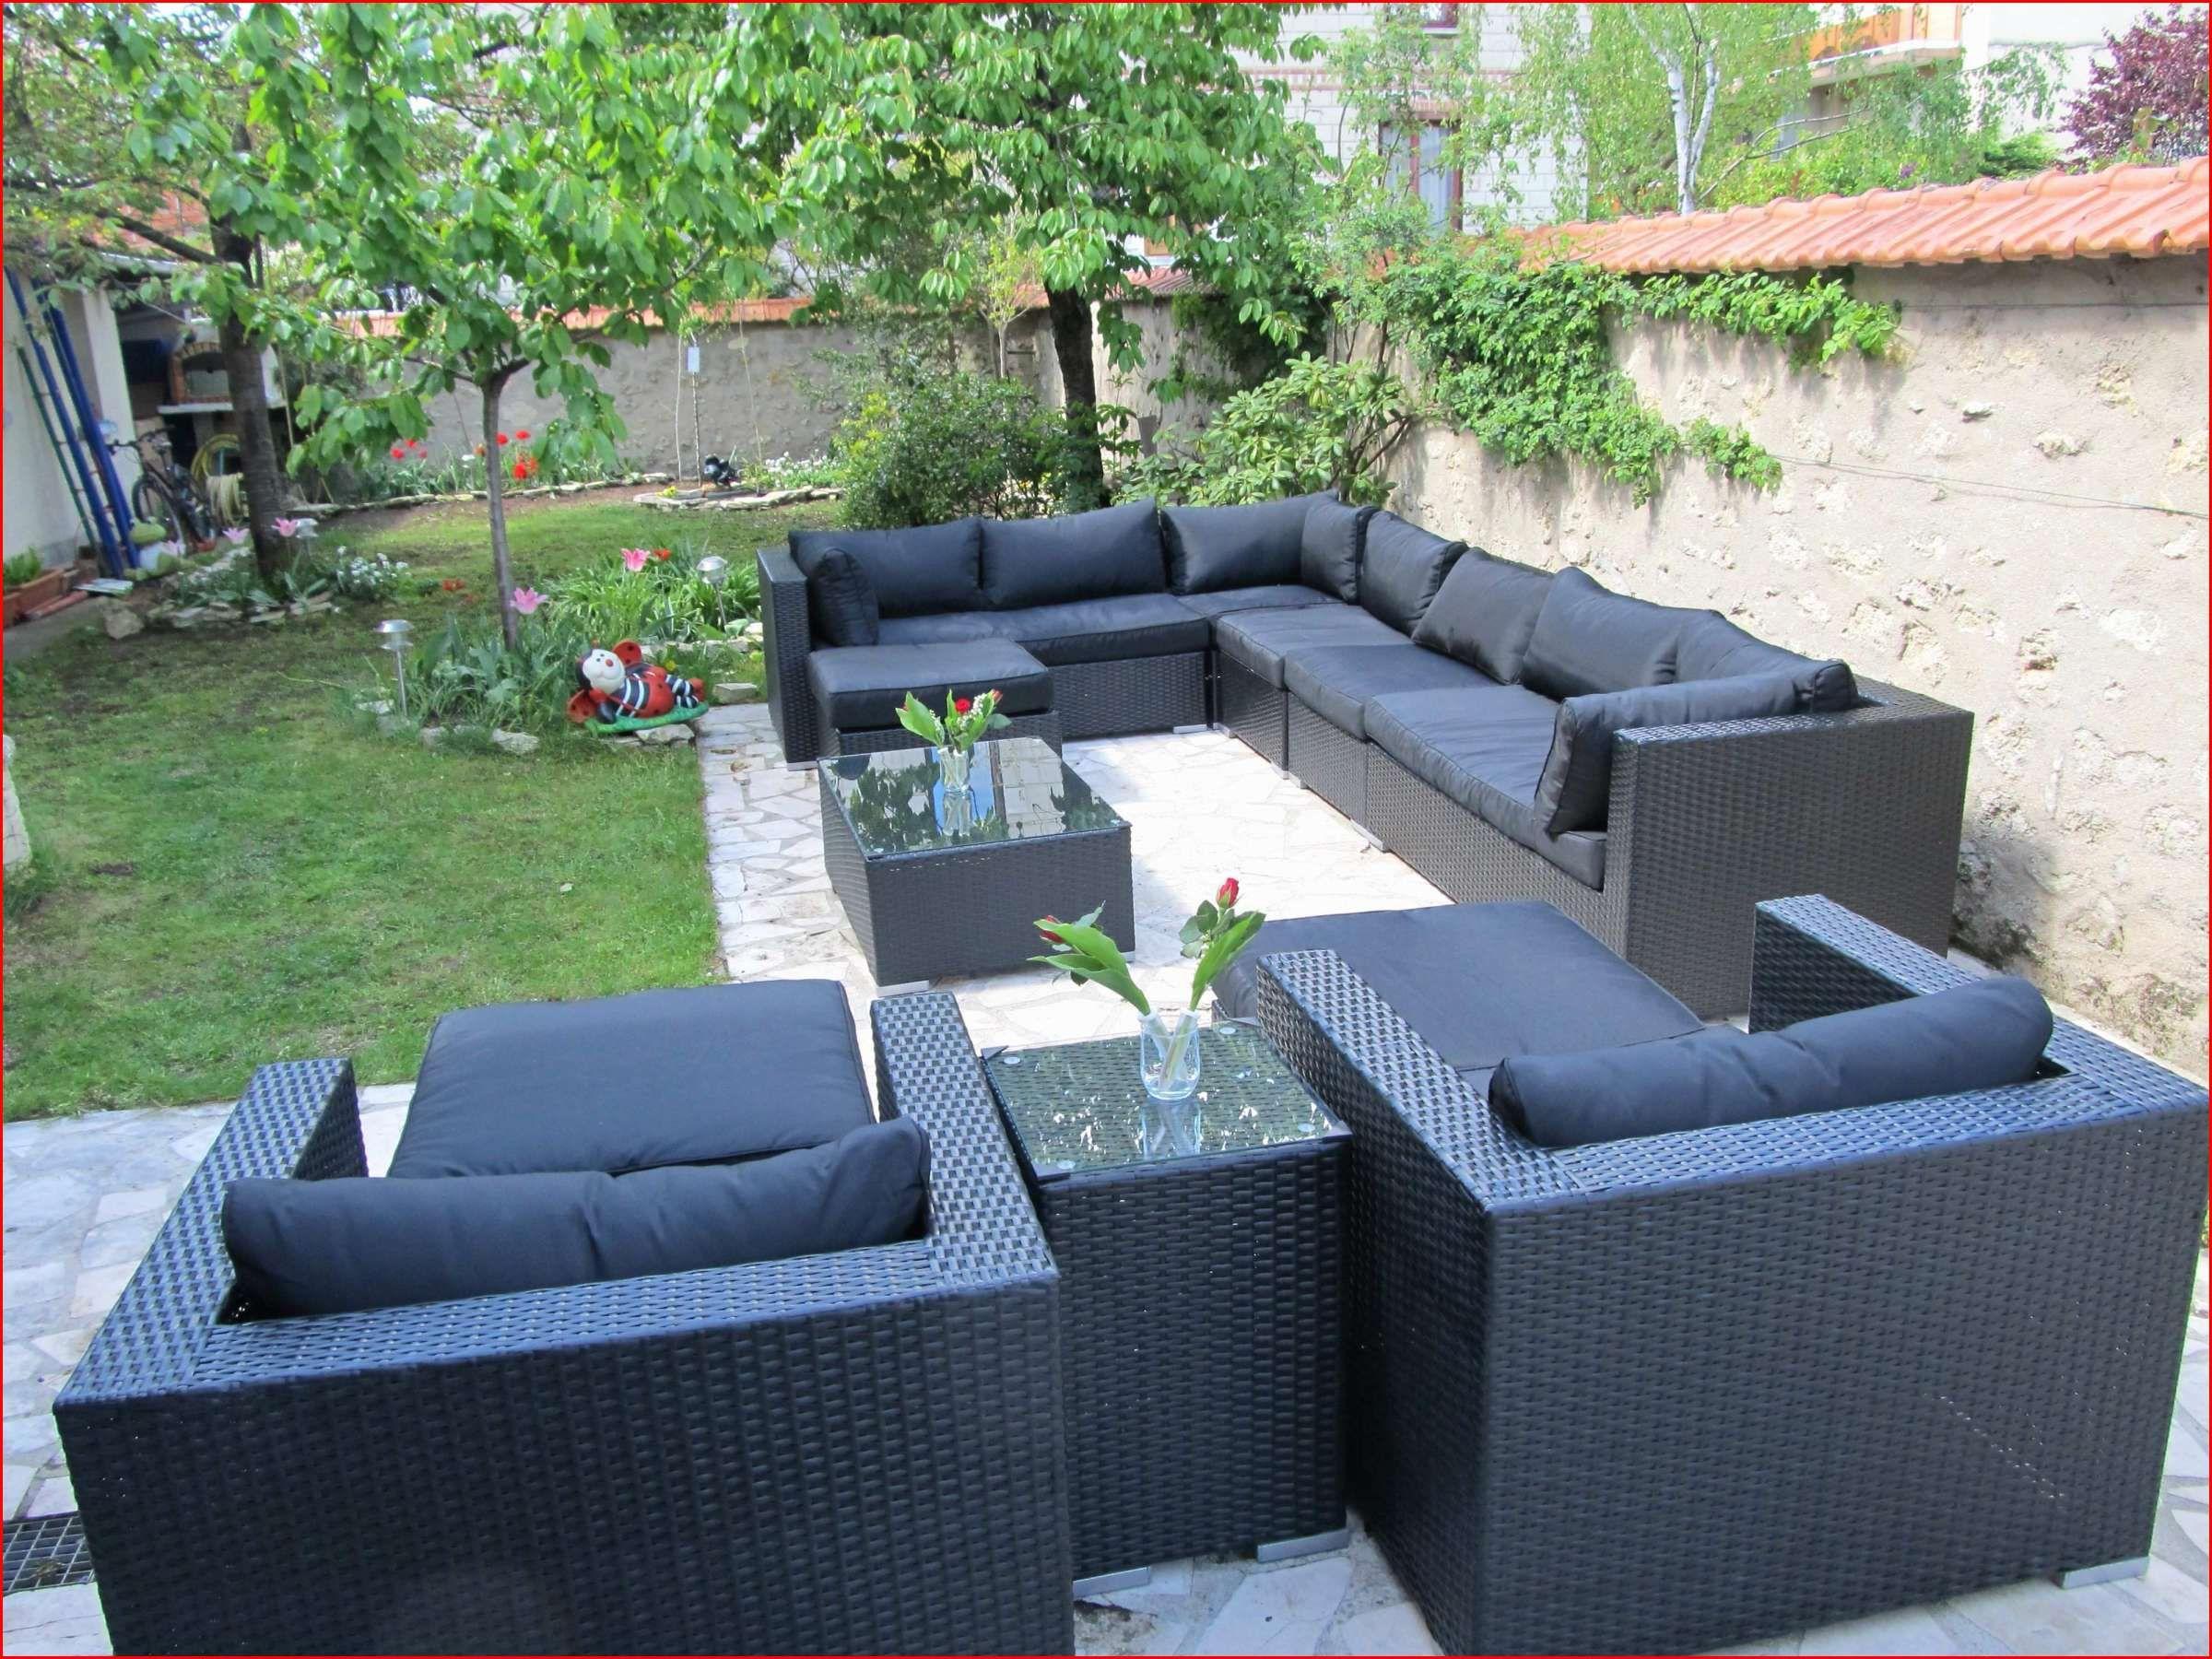 15+ Salon De Jardin Haut De Gamme ... concernant Mobilier Jardin Haut De Gamme